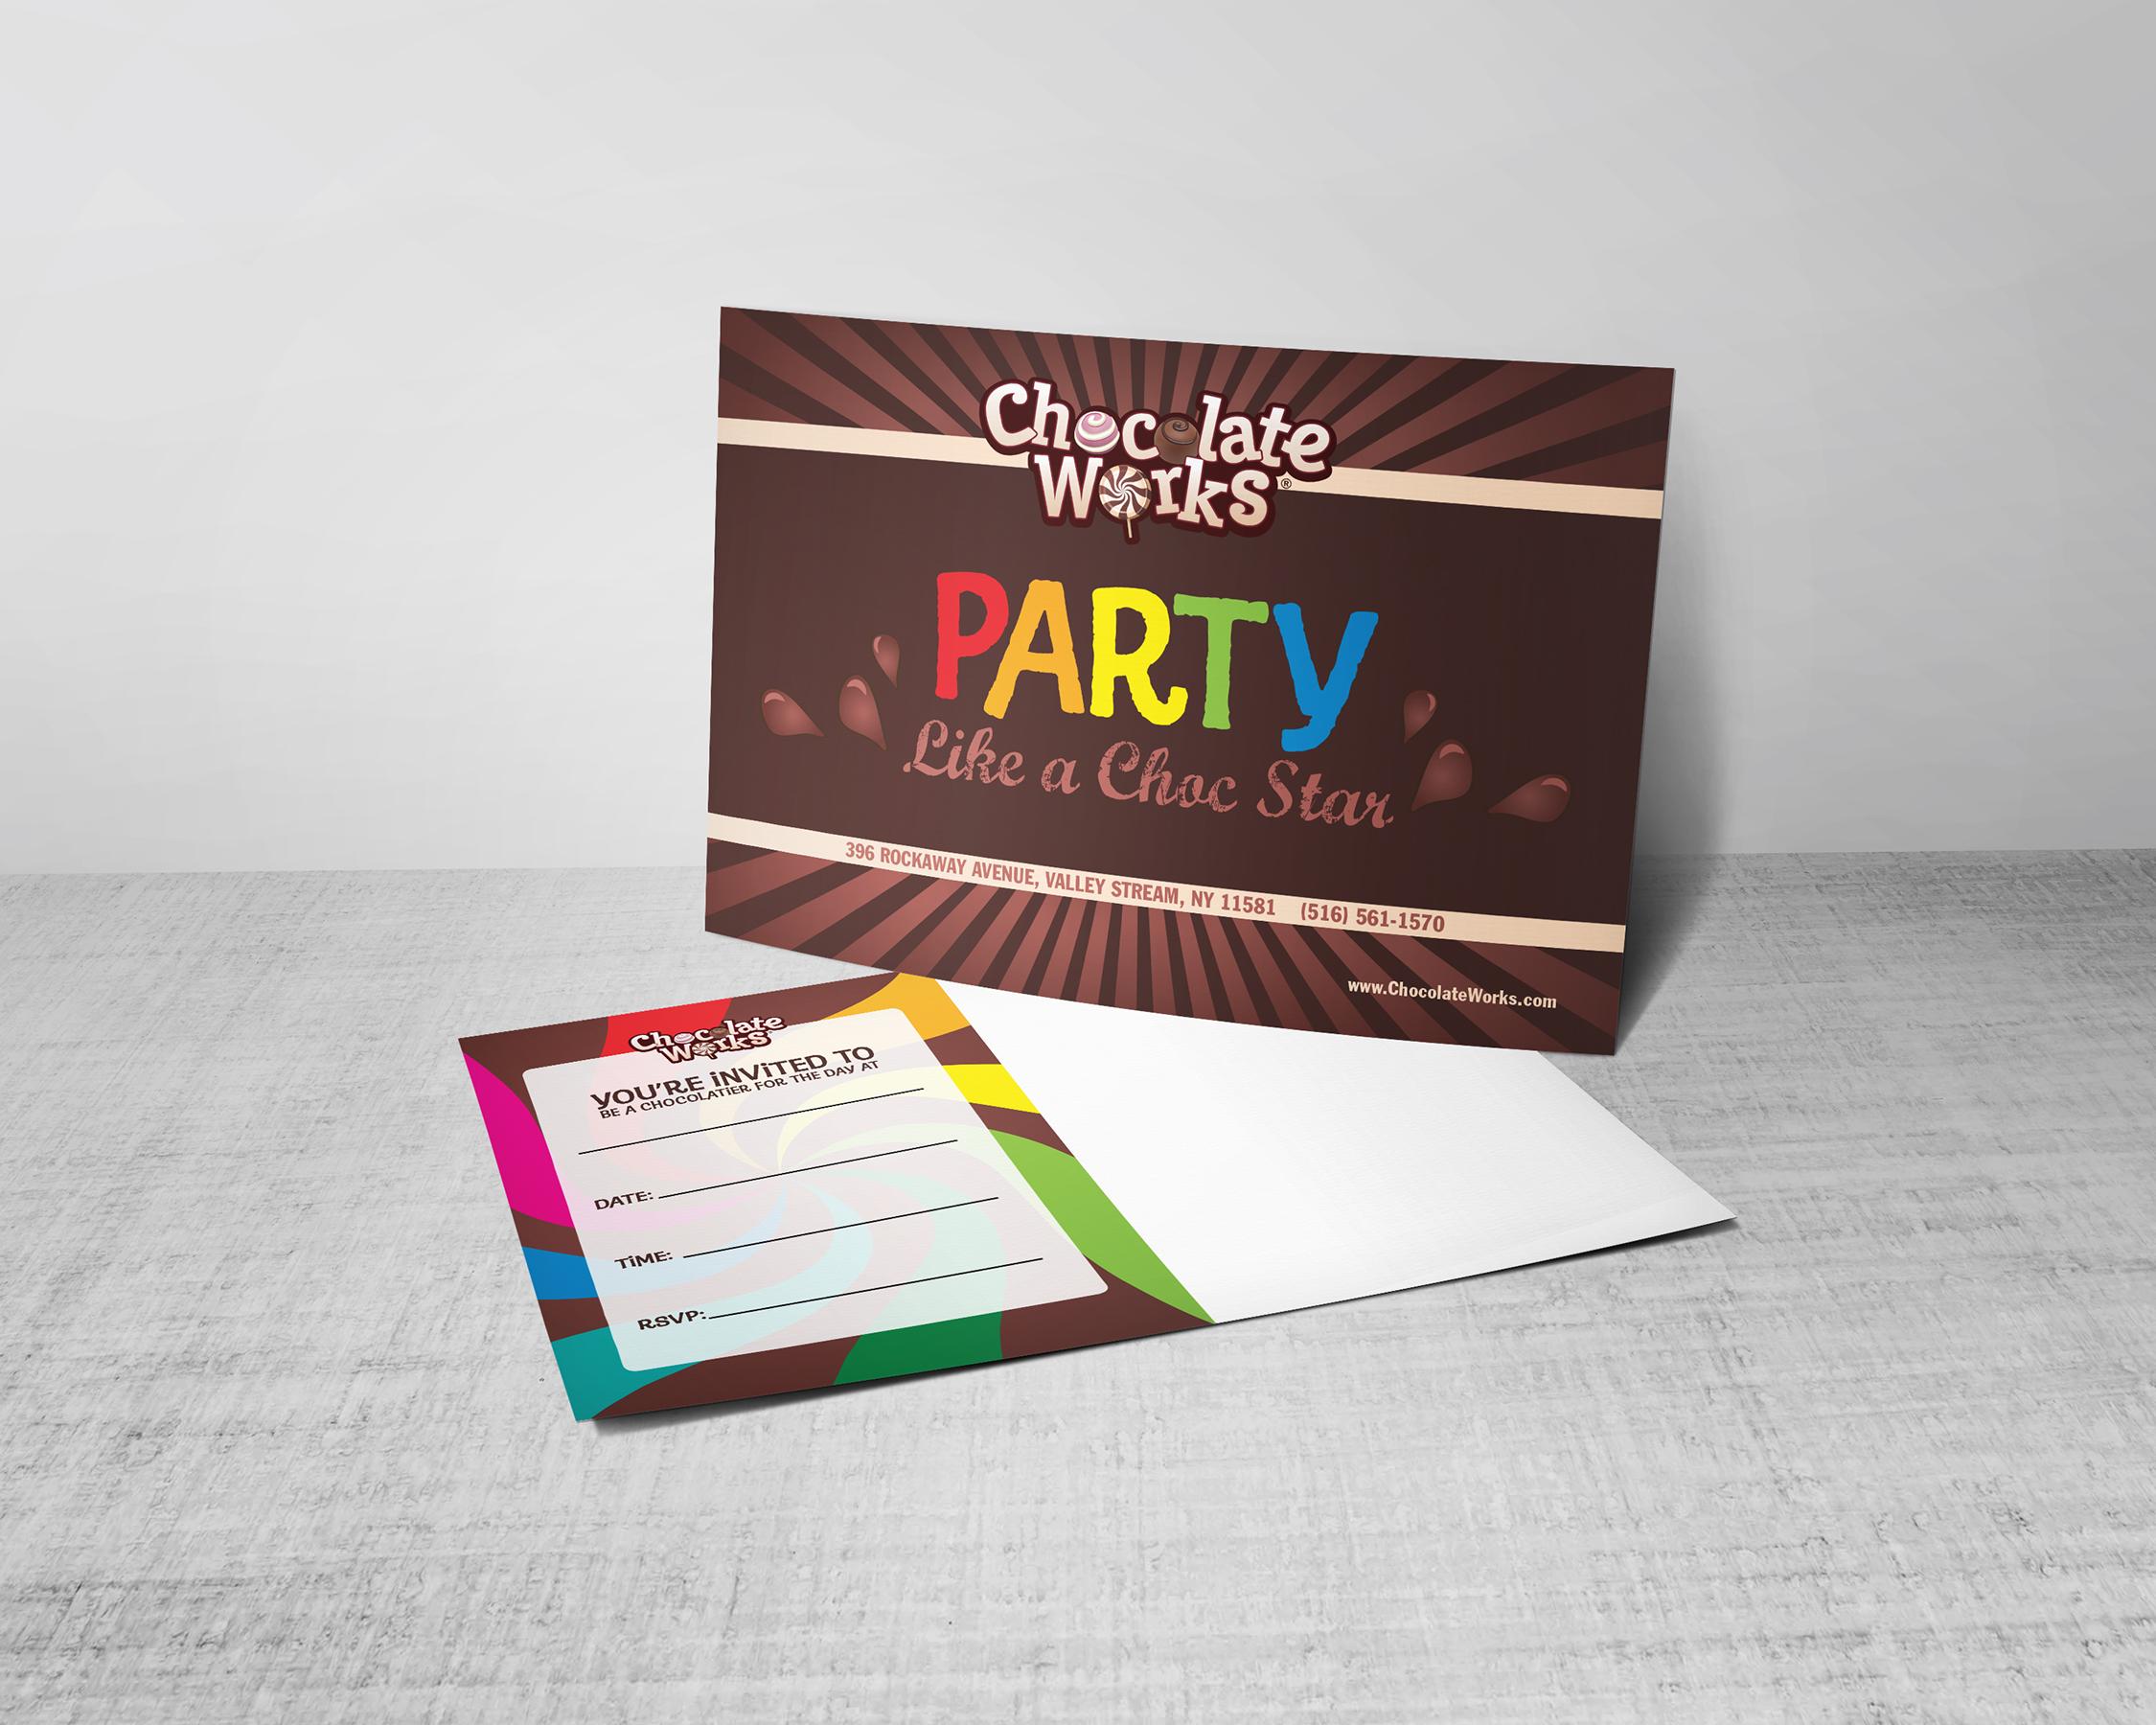 CW_Bday_Invite_postcard_mockup